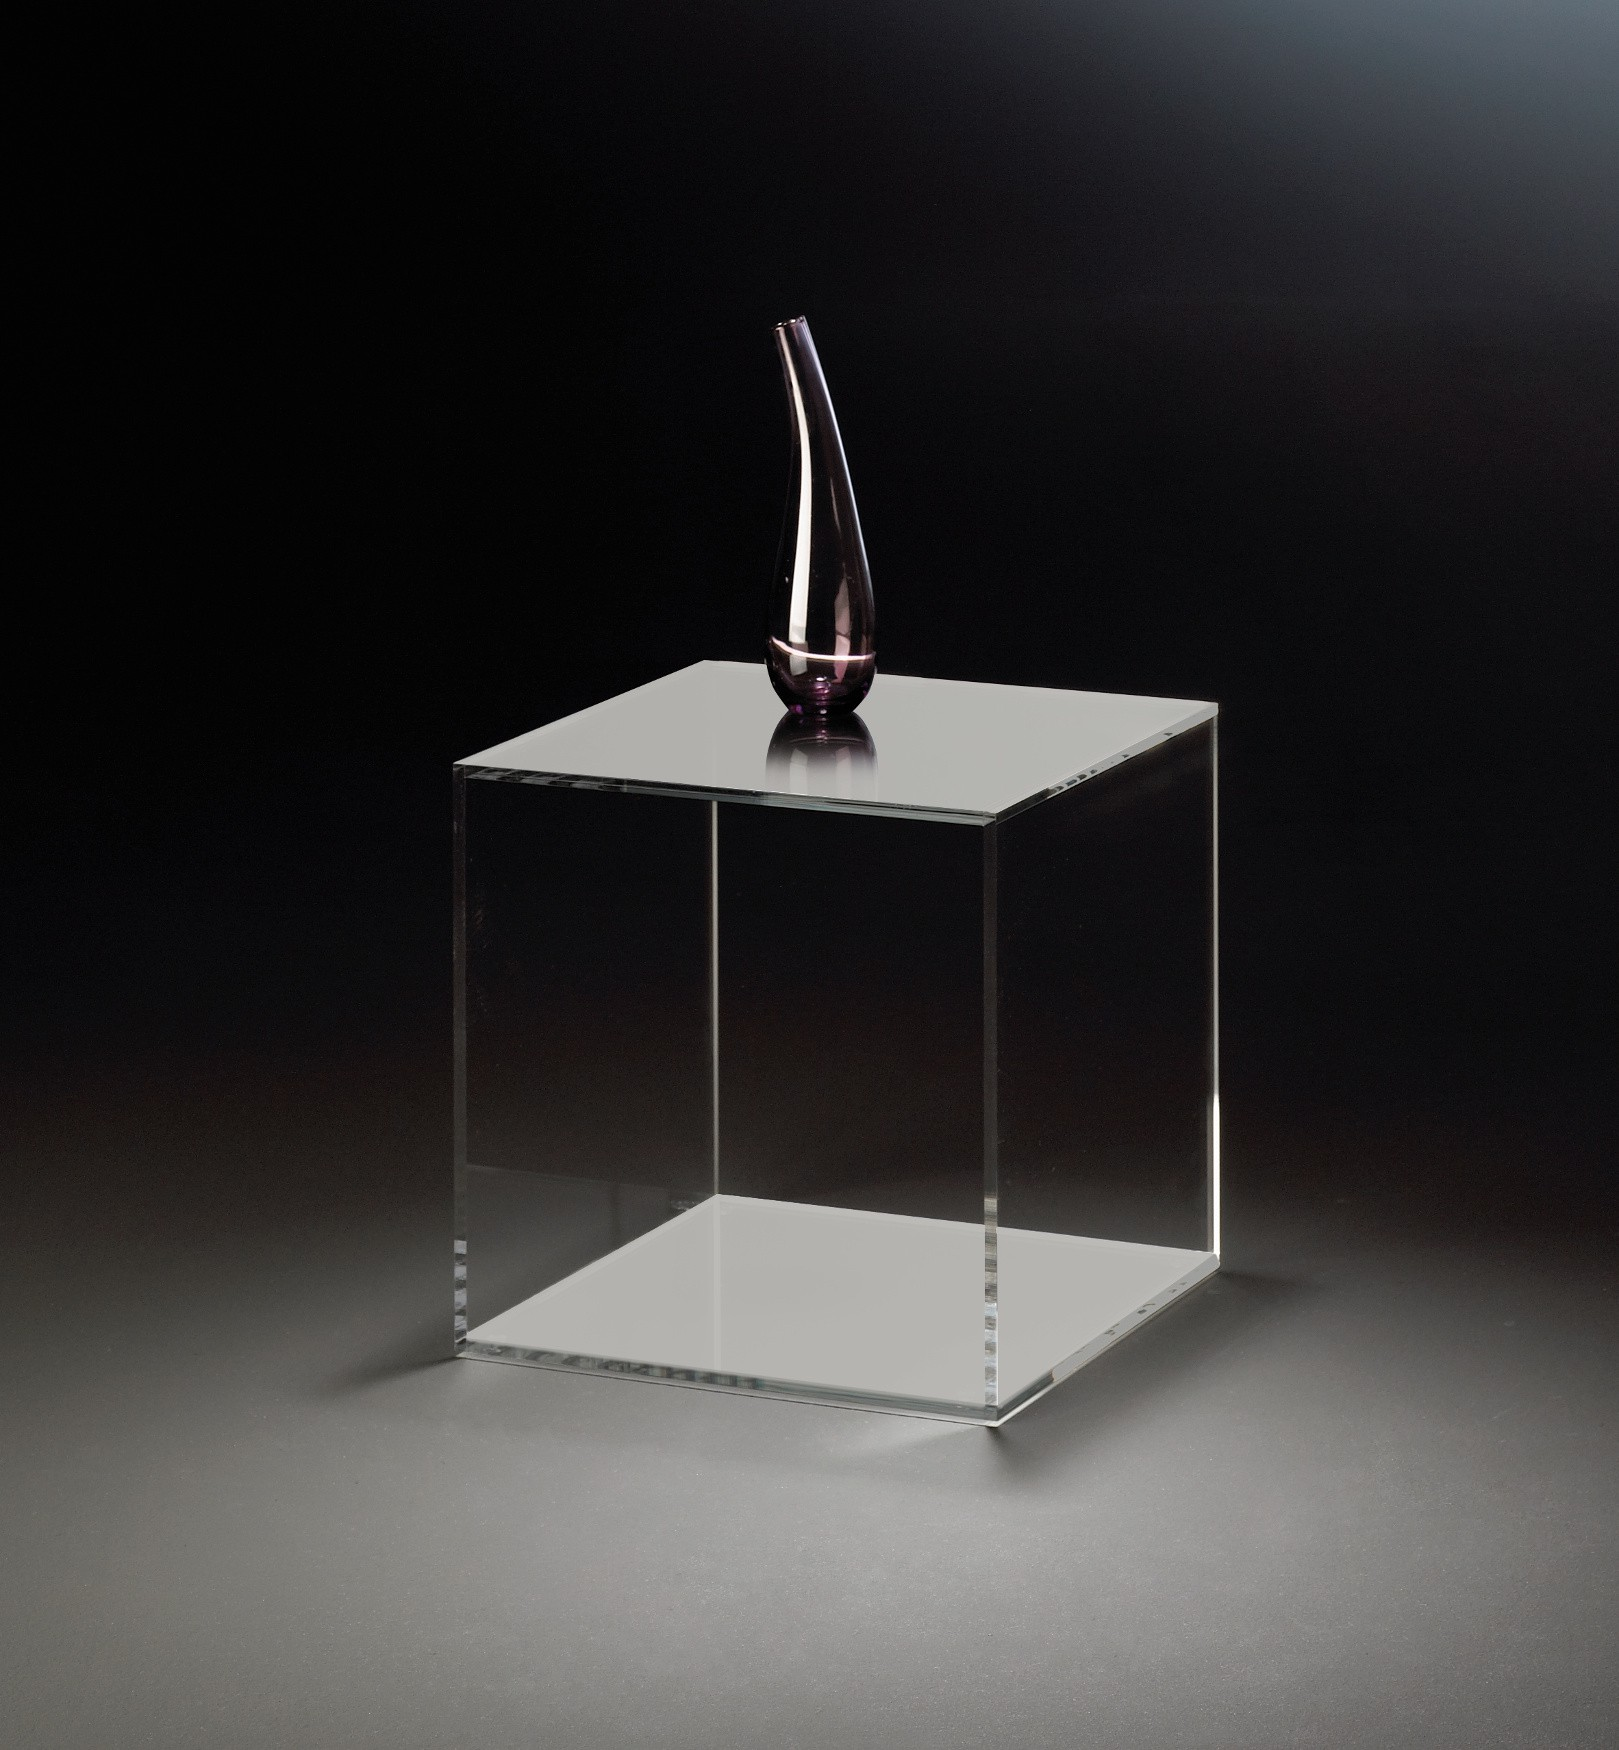 acrylw rfel vegas w rfel beistelltisch 35 cm aus acrylglas. Black Bedroom Furniture Sets. Home Design Ideas